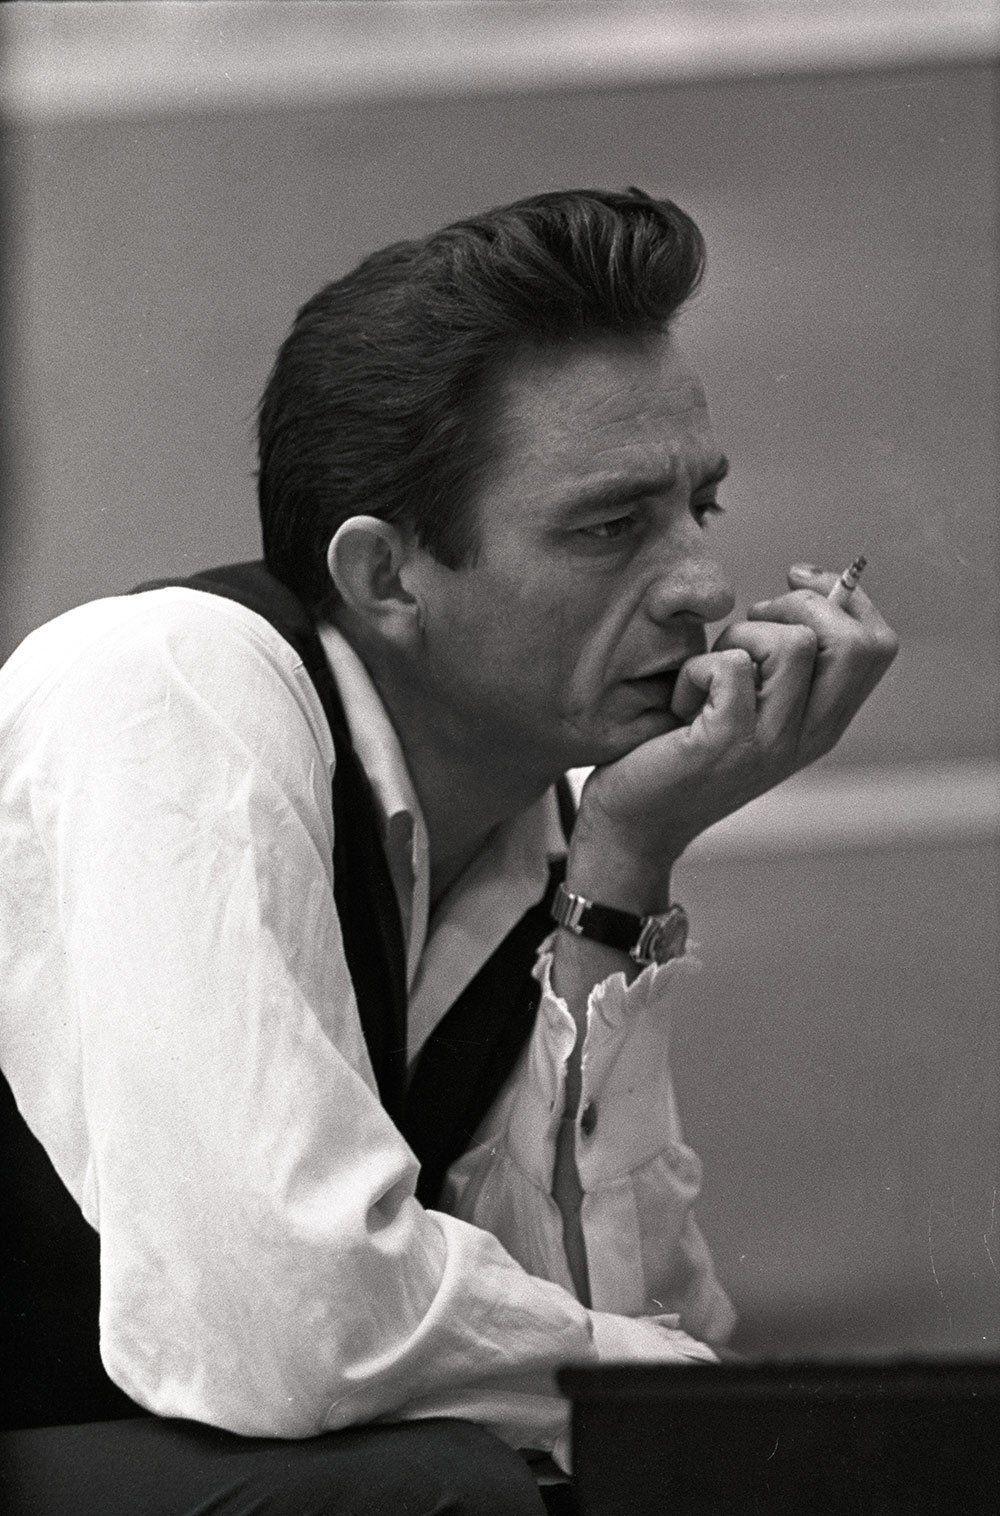 Tv Shows Johnny Cash Shirt Outfit Johnny Cash Mugshot Johnny Cash Love Letter Johnny Cash Albu In 2020 Young Johnny Cash Johnny Cash Lyrics Songs Johnny Cash Quotes